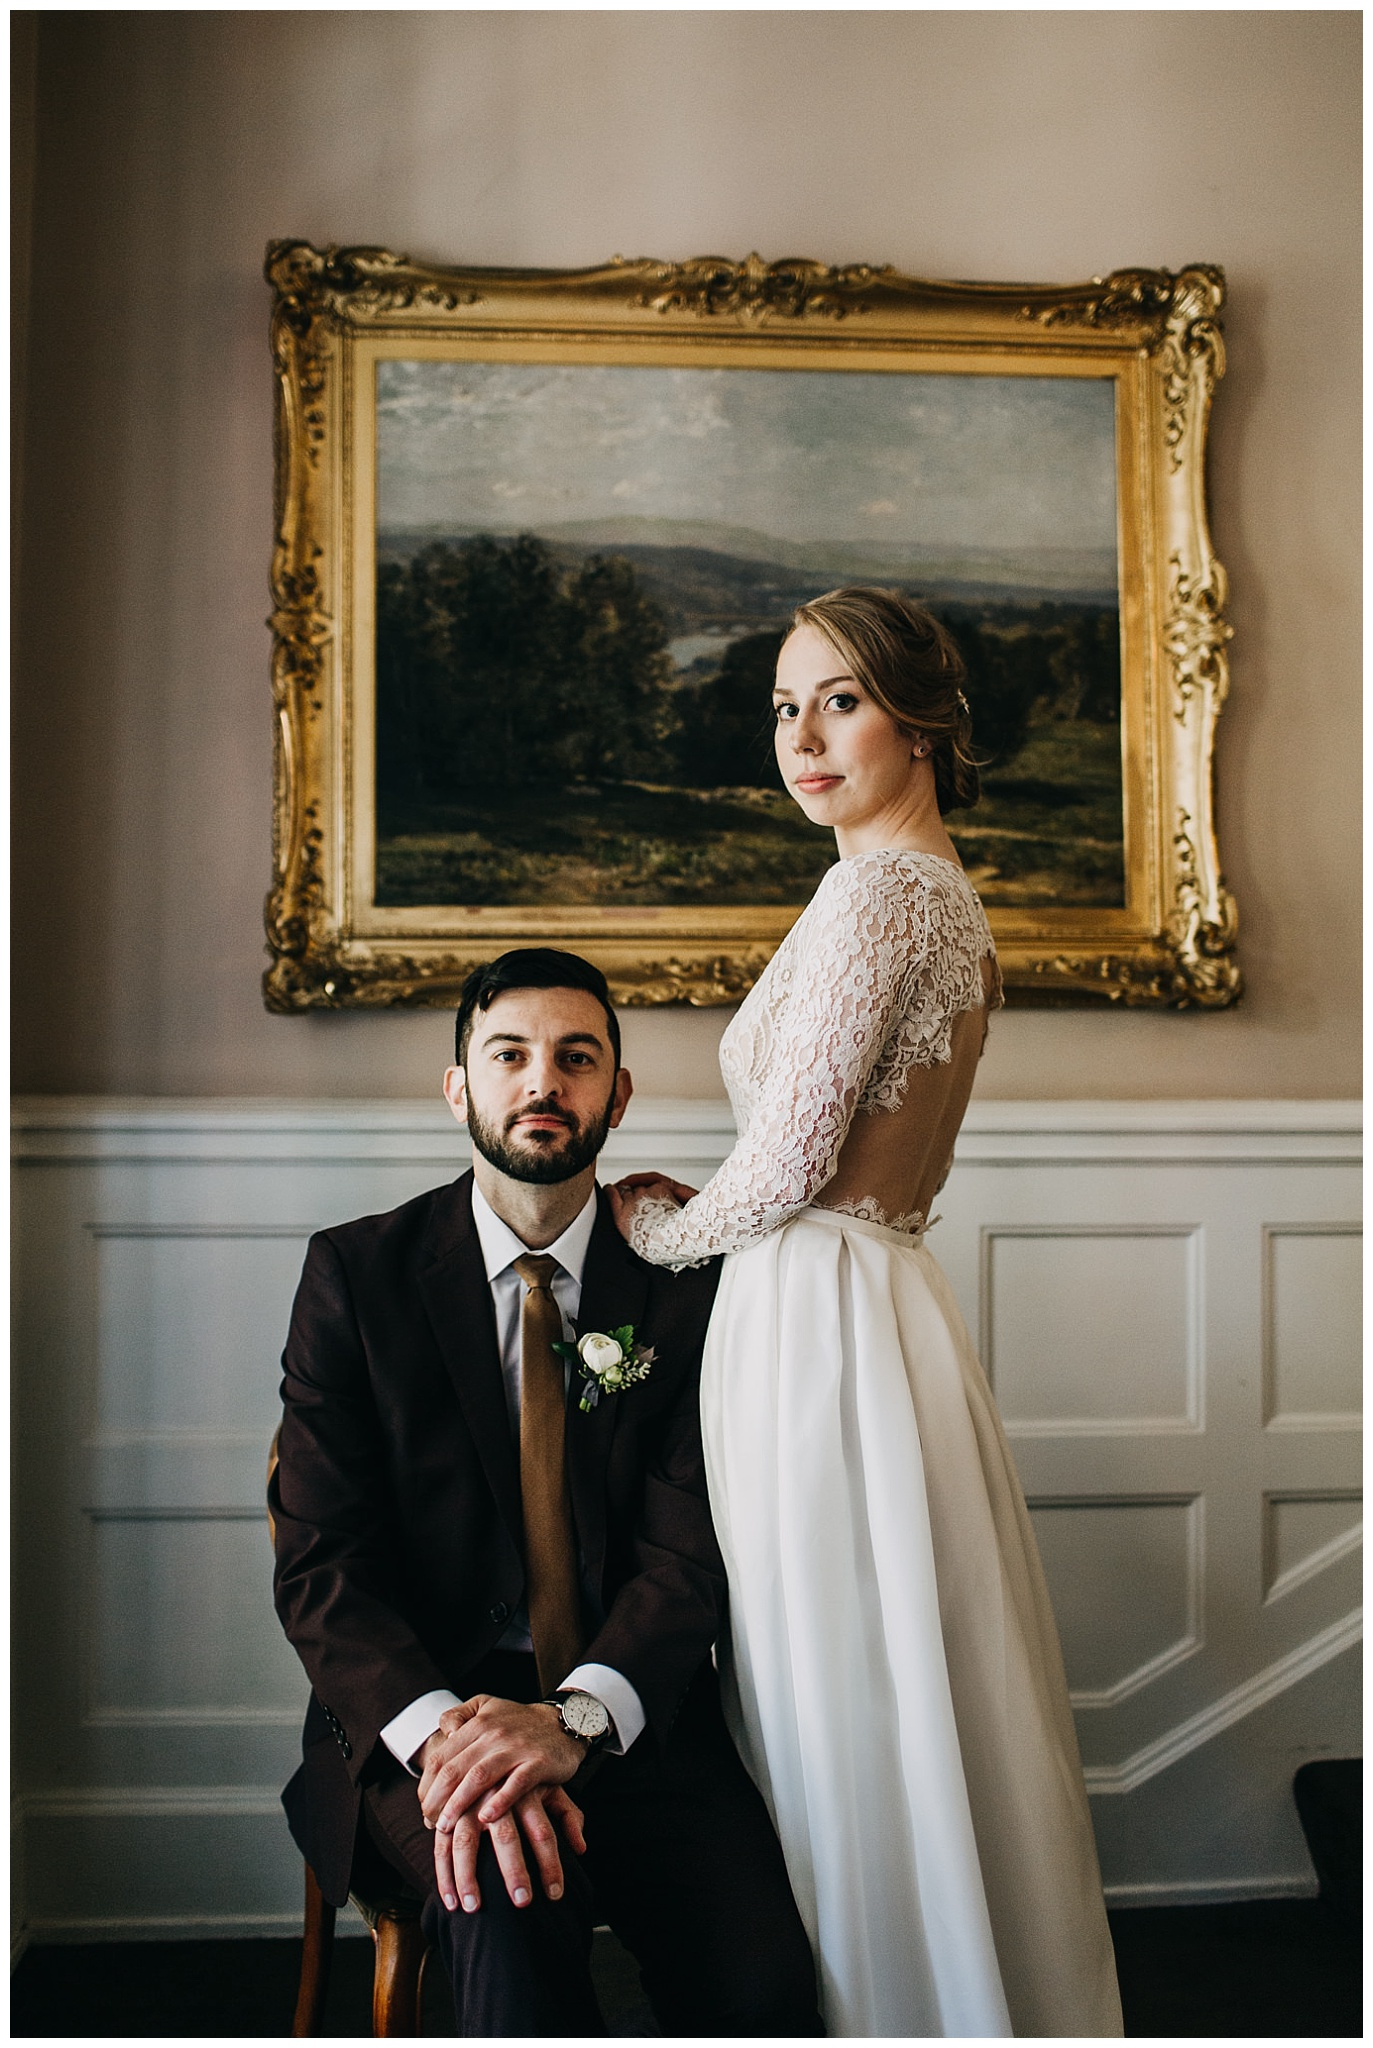 editorial bride and groom portrait inside hycroft manor wedding